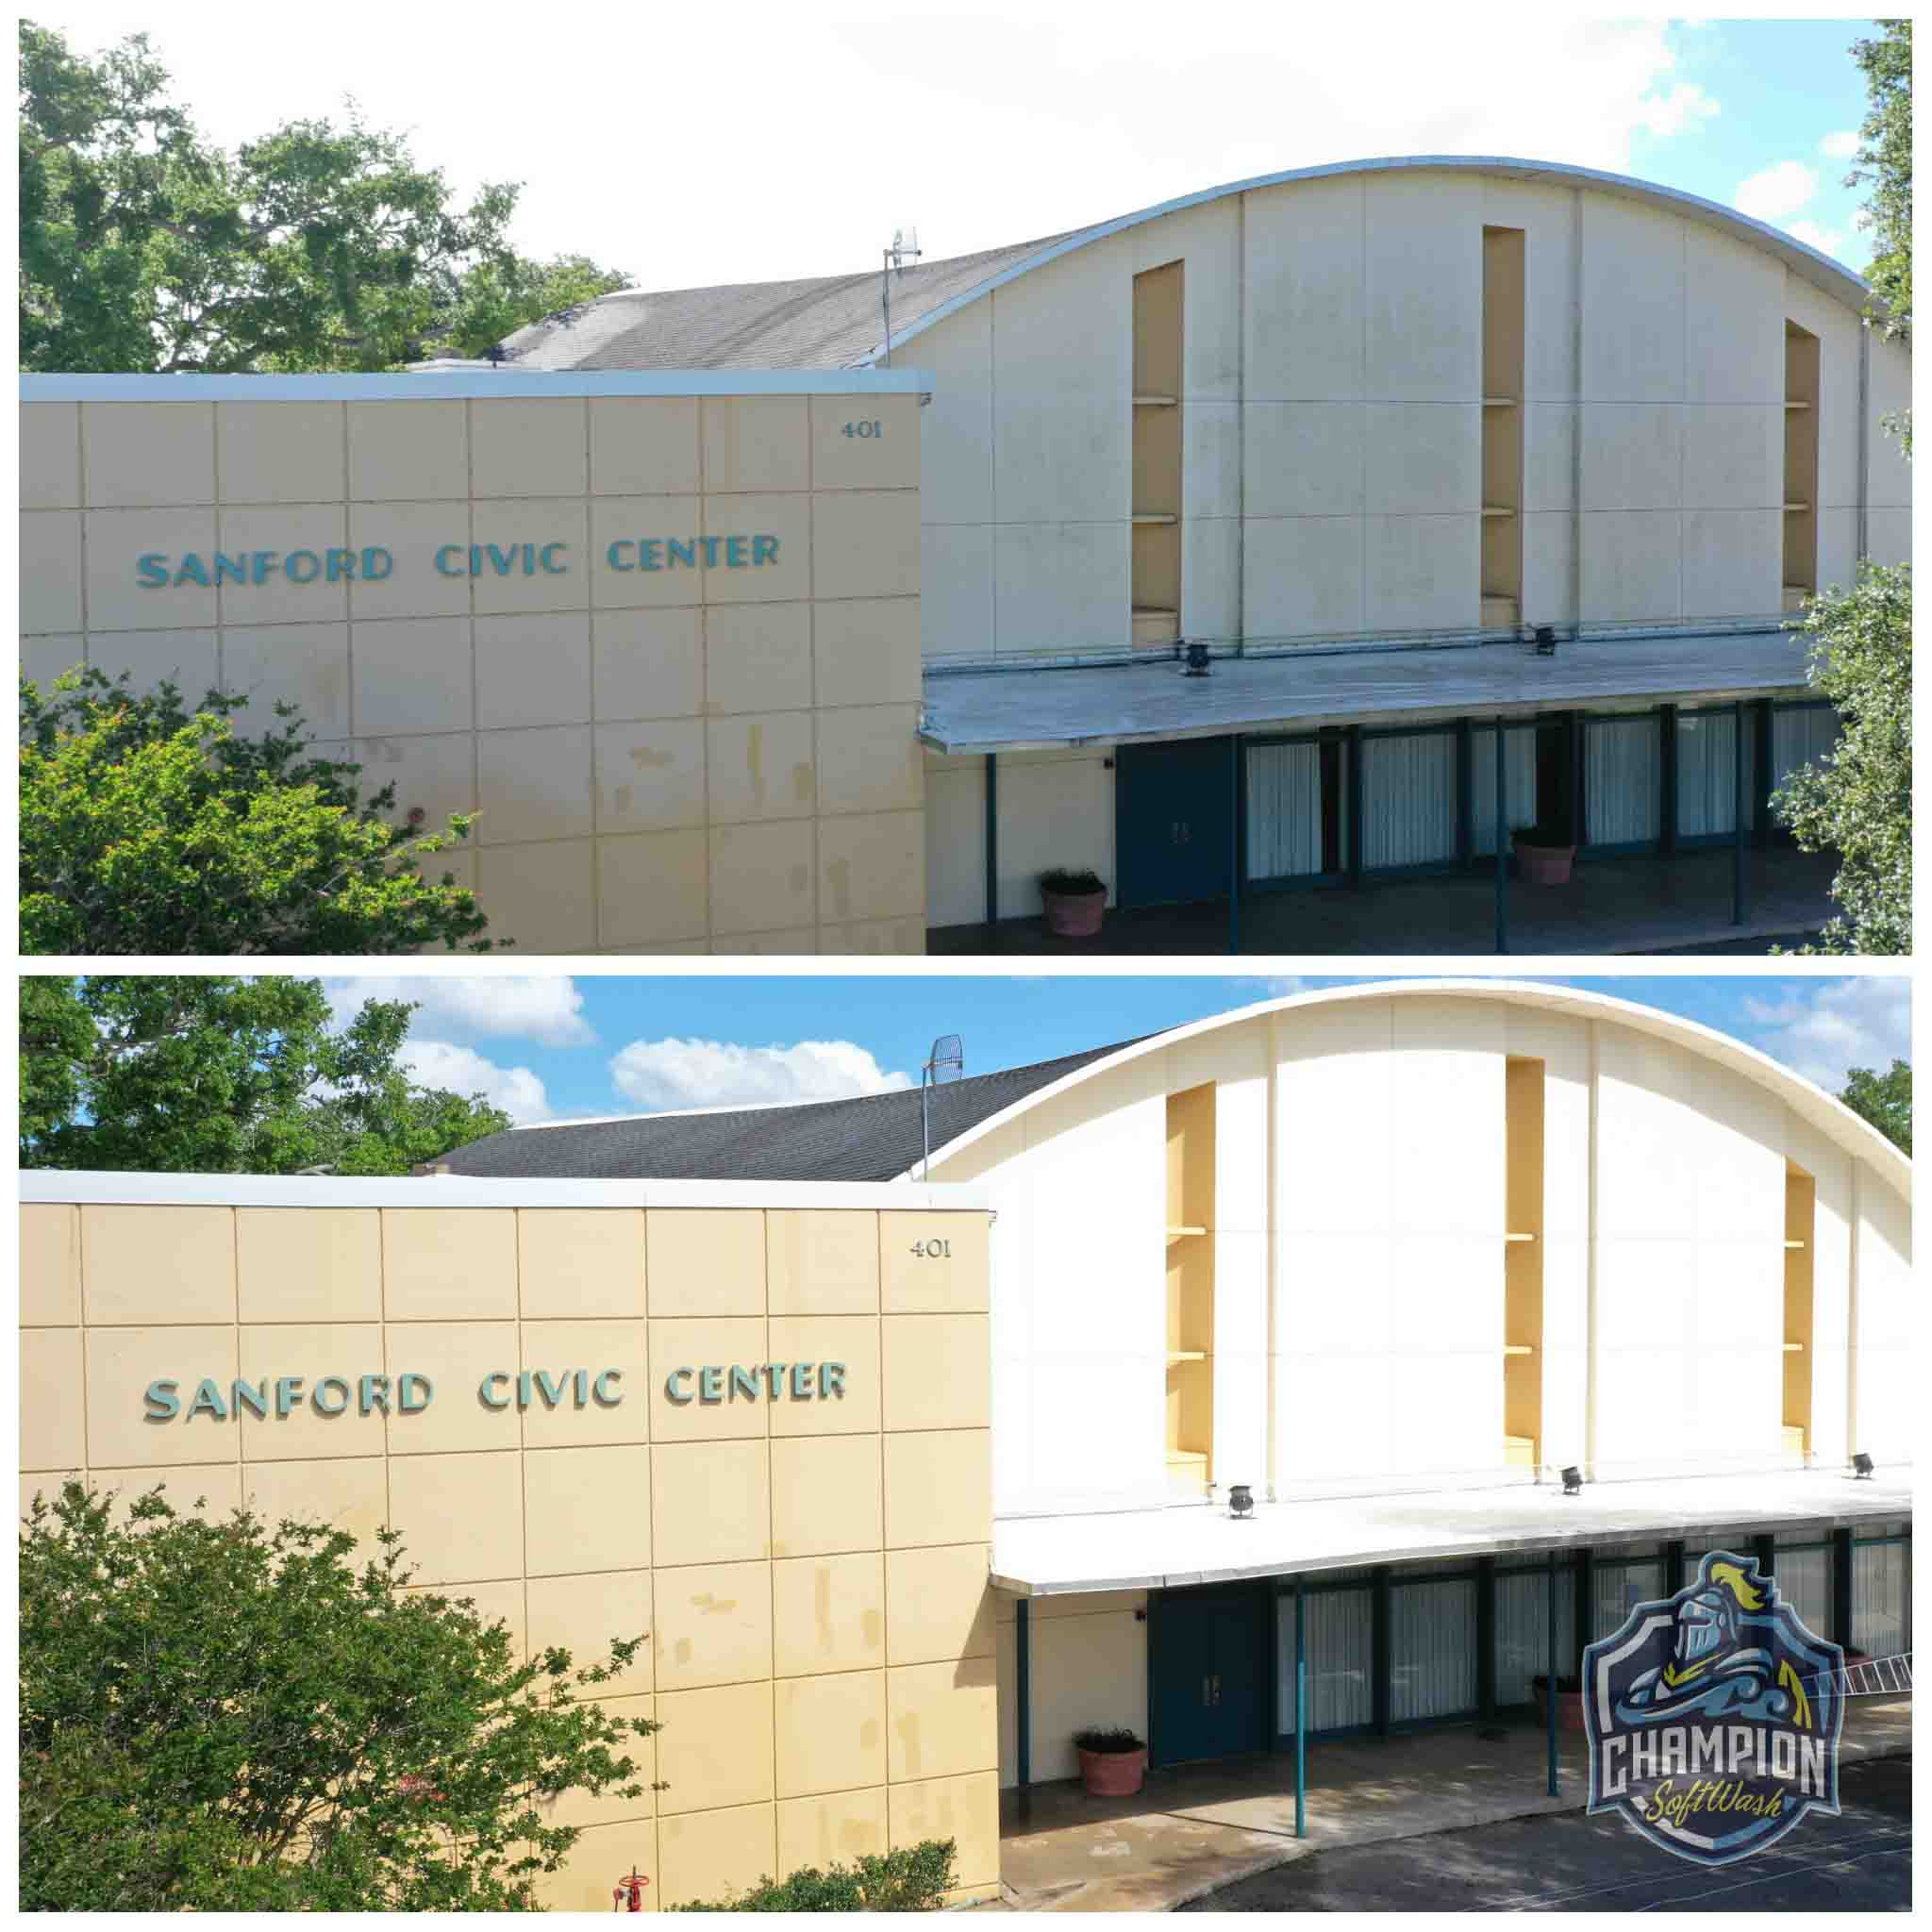 Sanford Civic Center, Soft washing of commercial municipal building in Sanford, FL